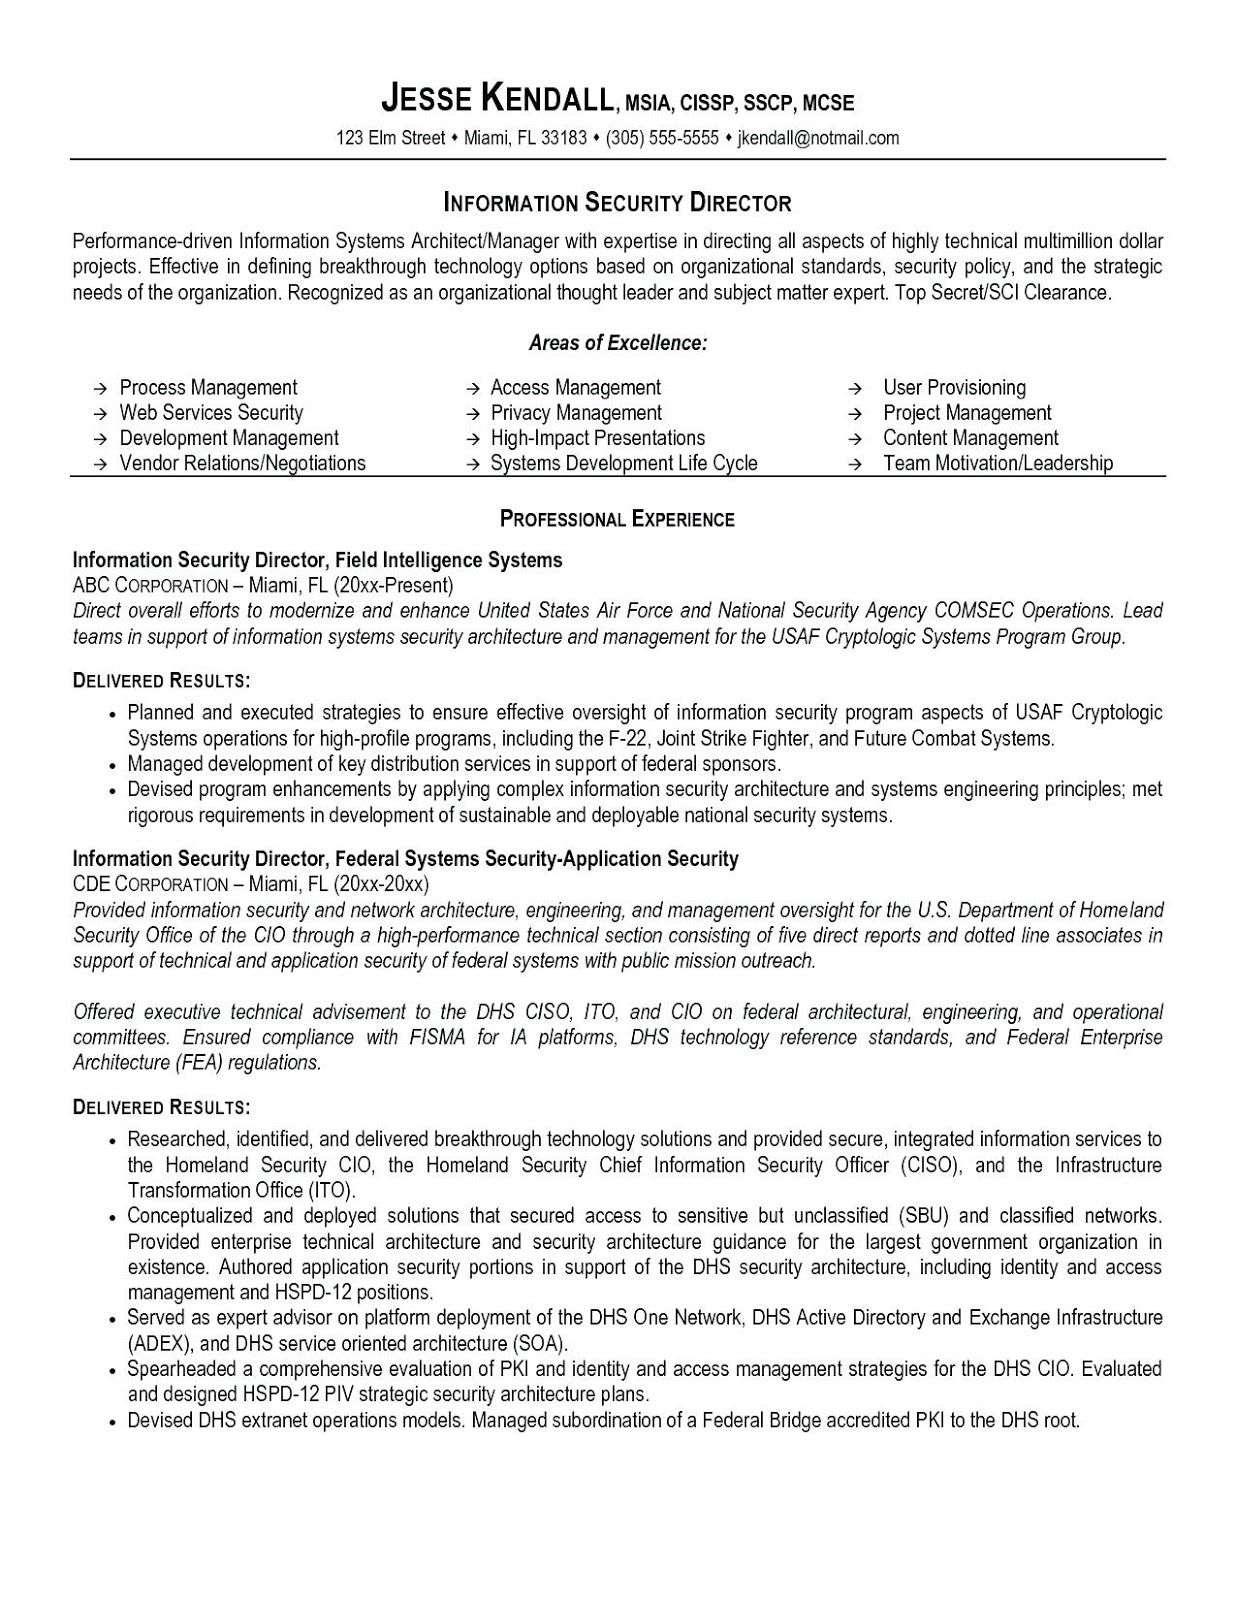 Network Architect Resume Pdf 2019 Network Architect Resume Objective 2020 Network Architect Resume Pdf Network Archi Security Resume Resume Examples Resume Pdf